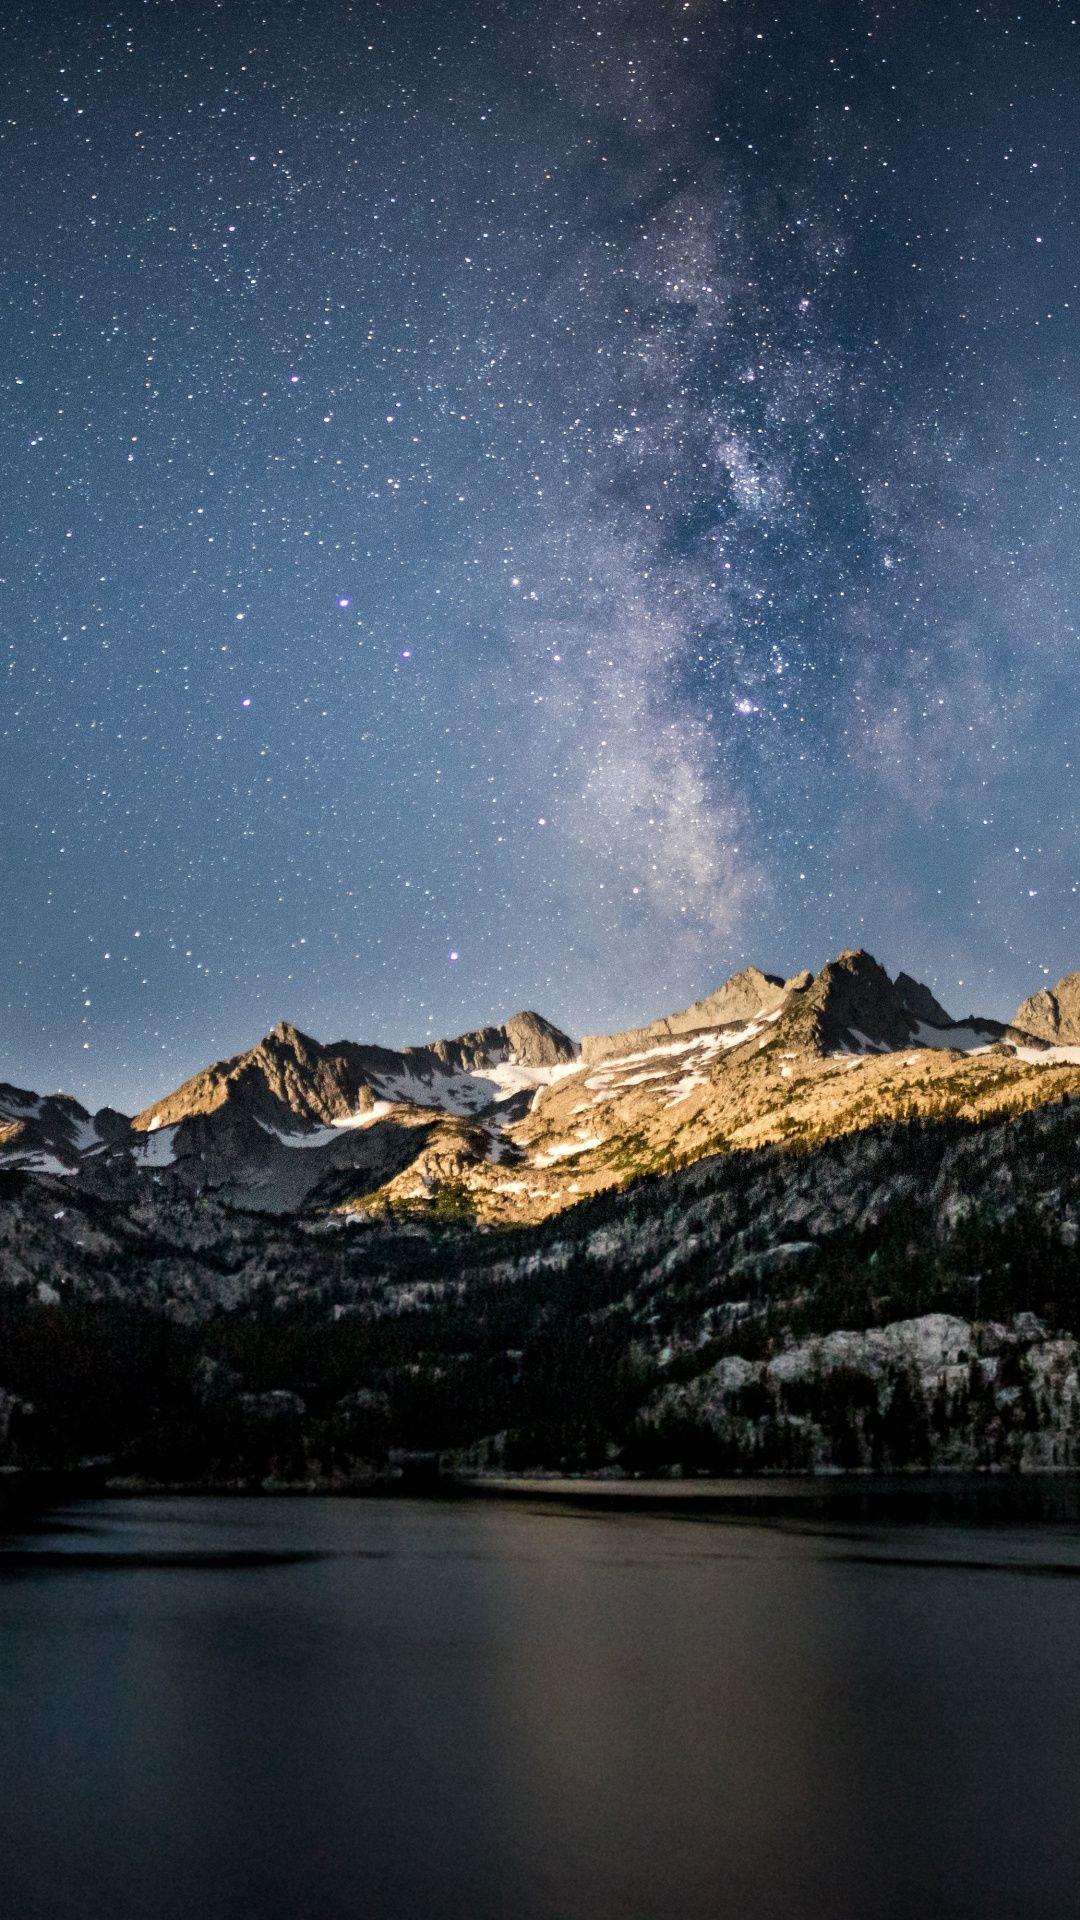 Mountains, night, milky way, Eastern Sierras,